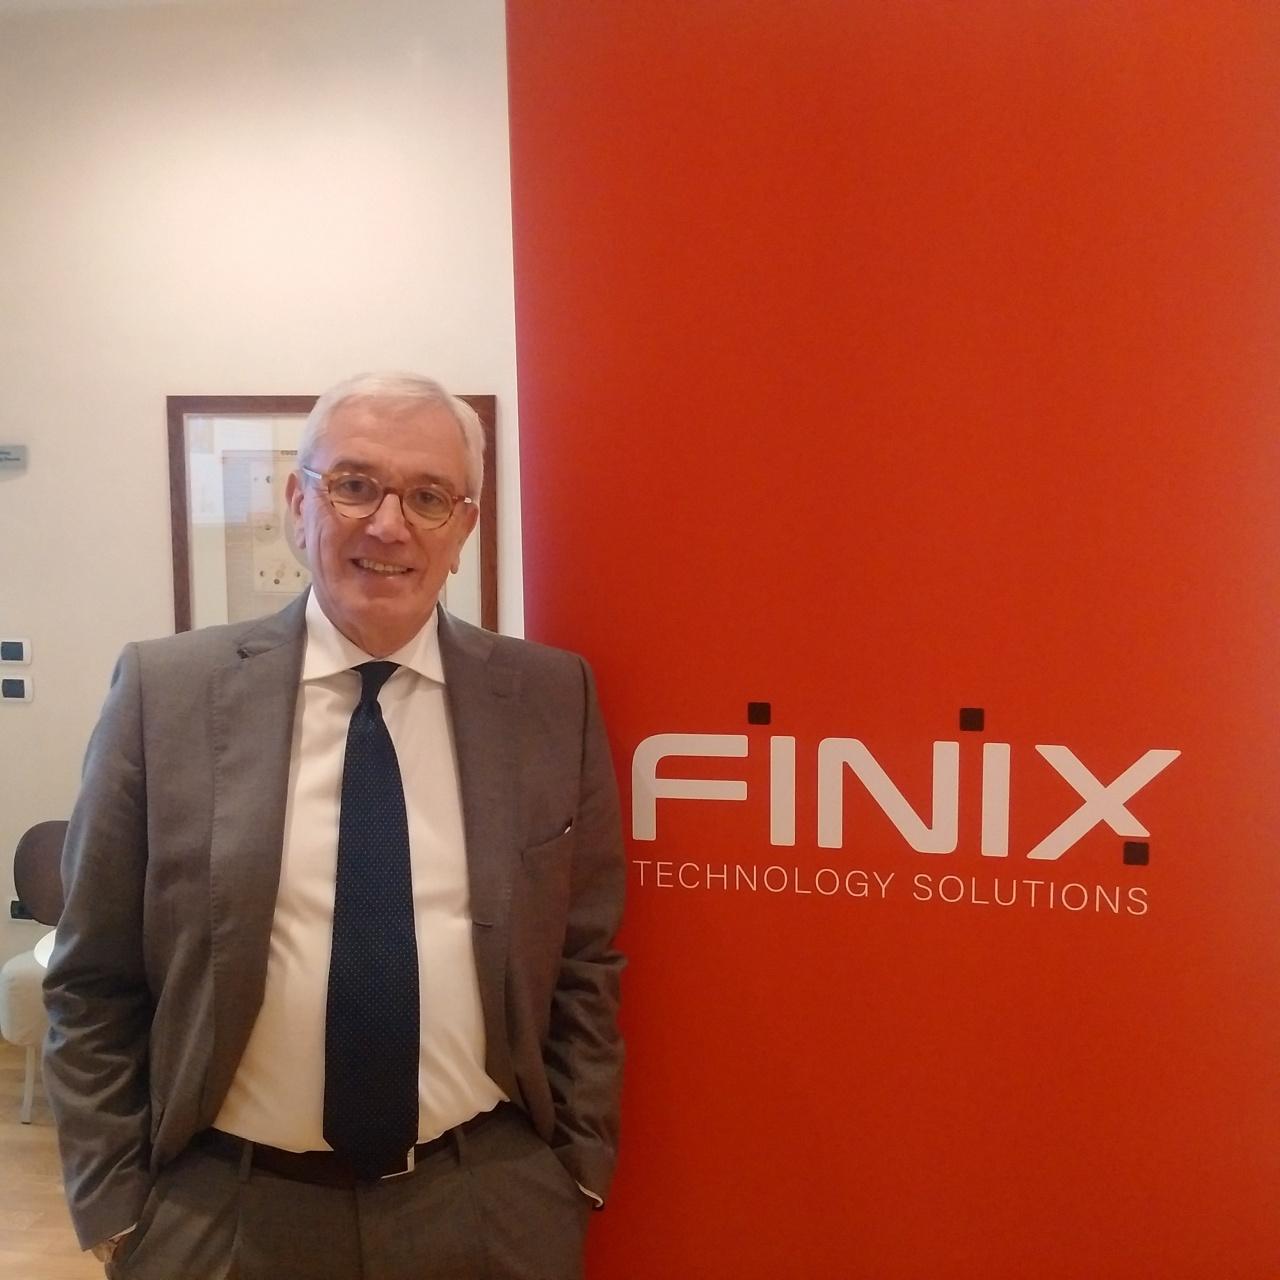 pierfilippo roggero  ceo finix technology solutions (1)